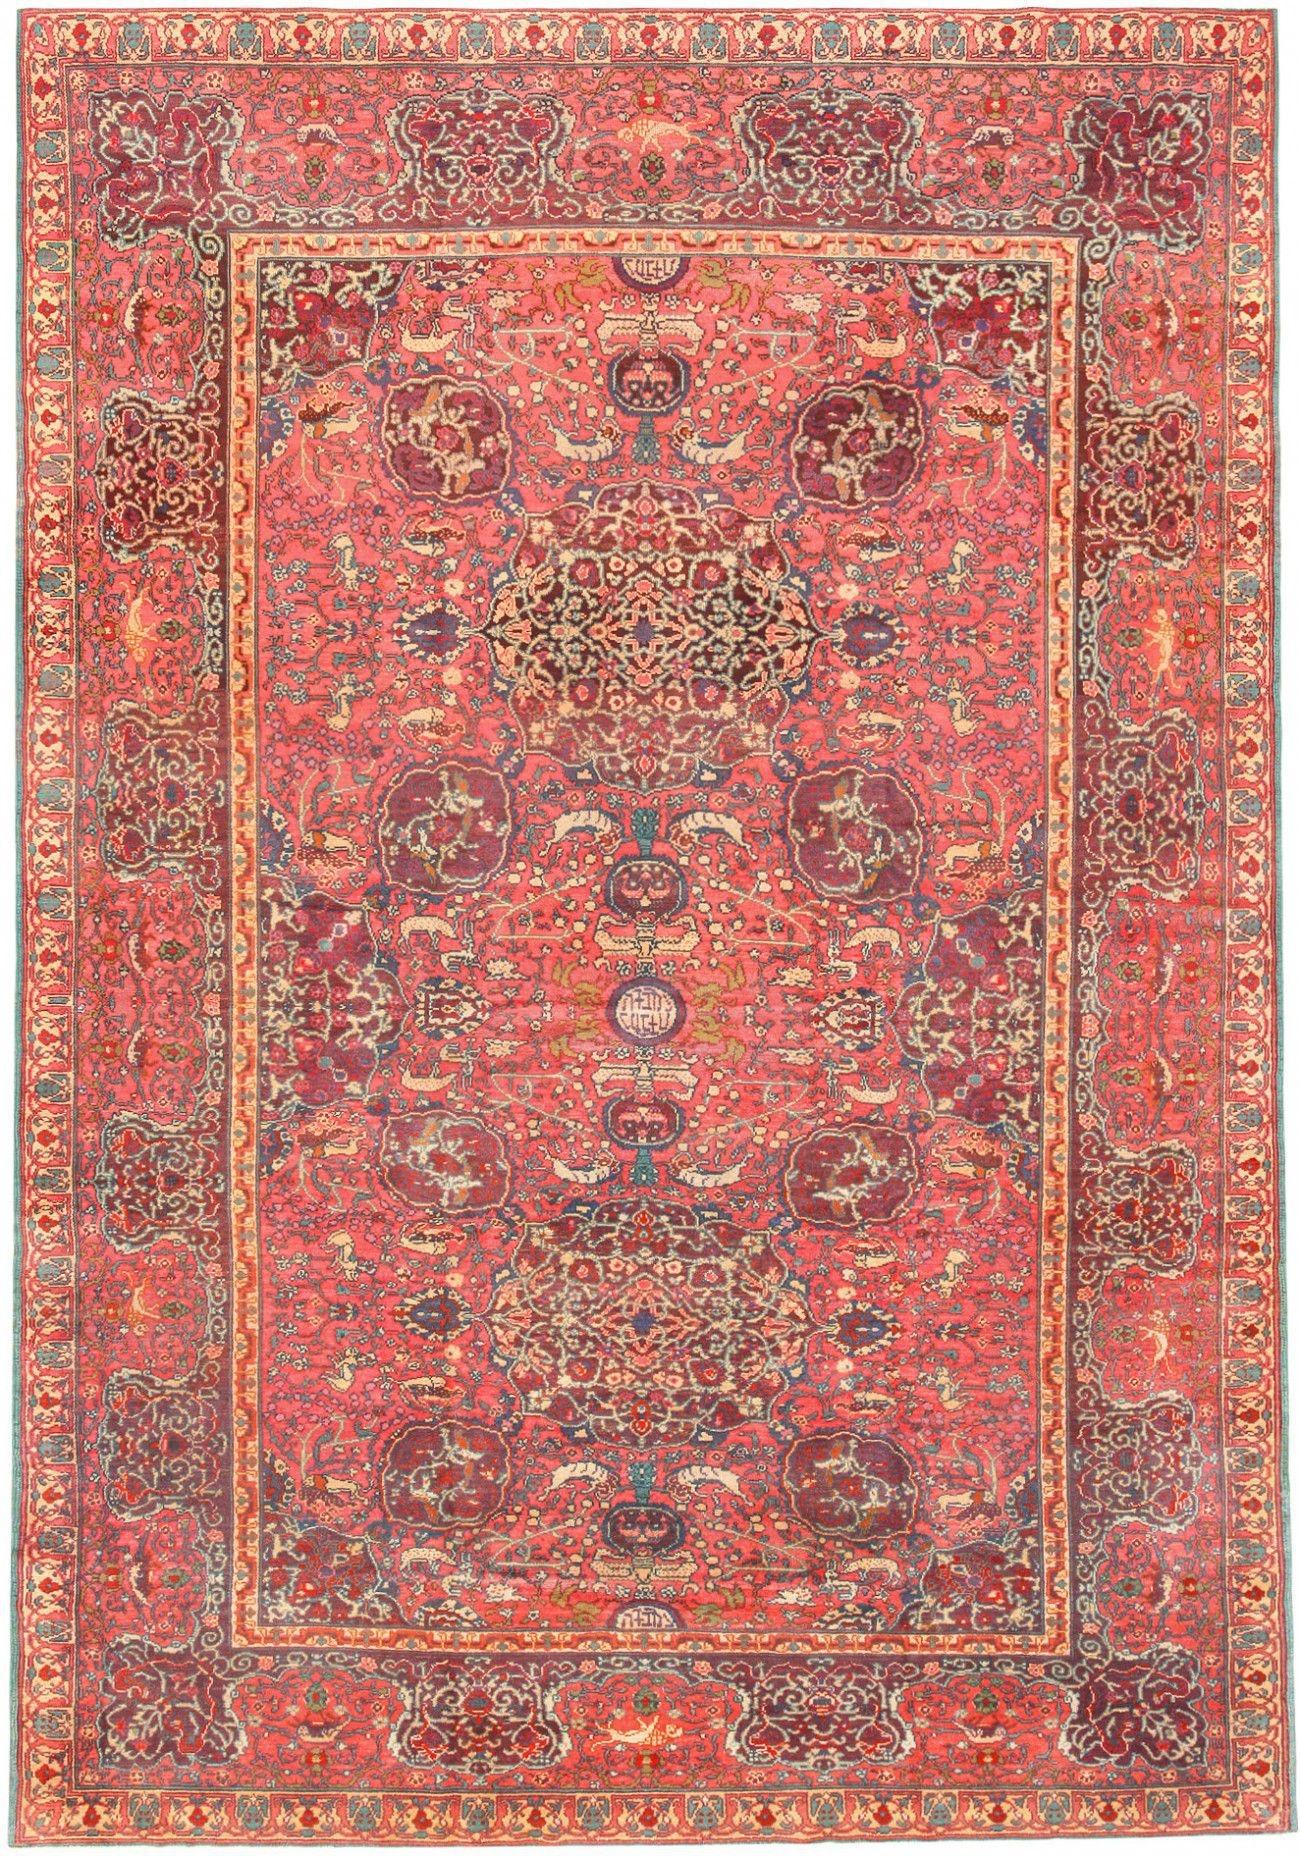 Judaica Rugs Rare Antique Jewish Israeli Carpet Collection Inside Carpet Rugs (View 13 of 15)